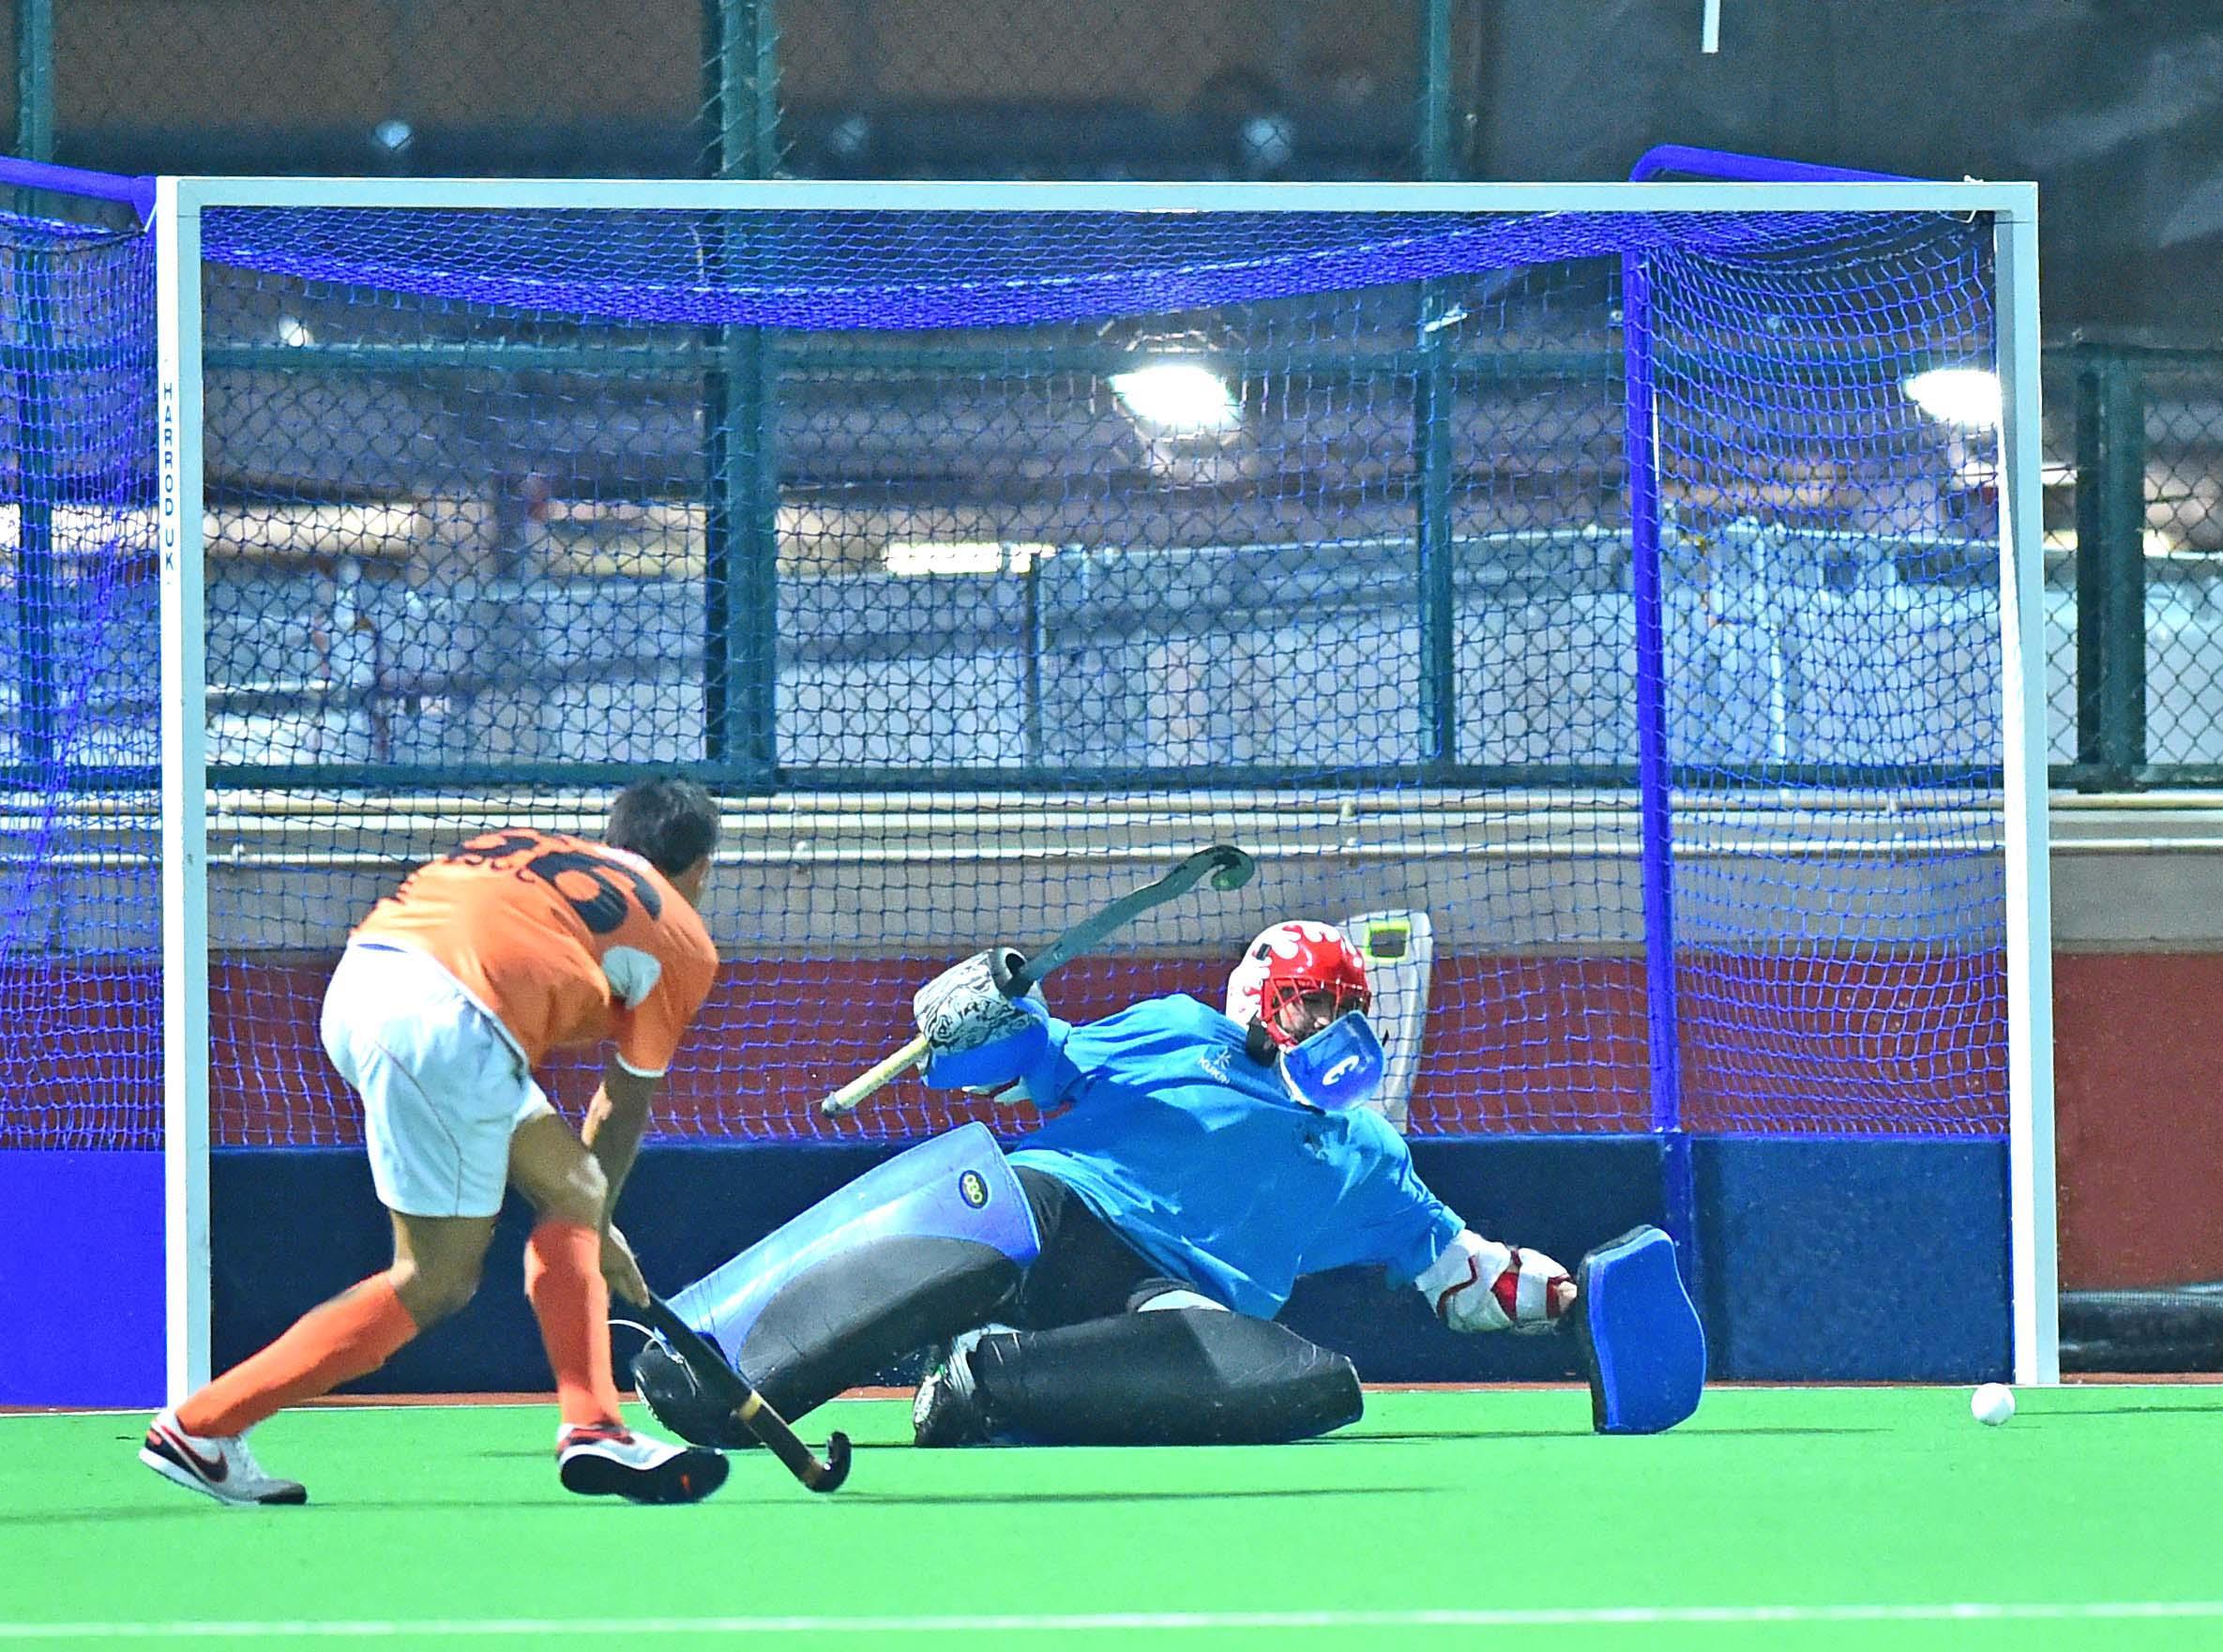 FiletdeHockey 3,66x1,7x0,9x1,2 m